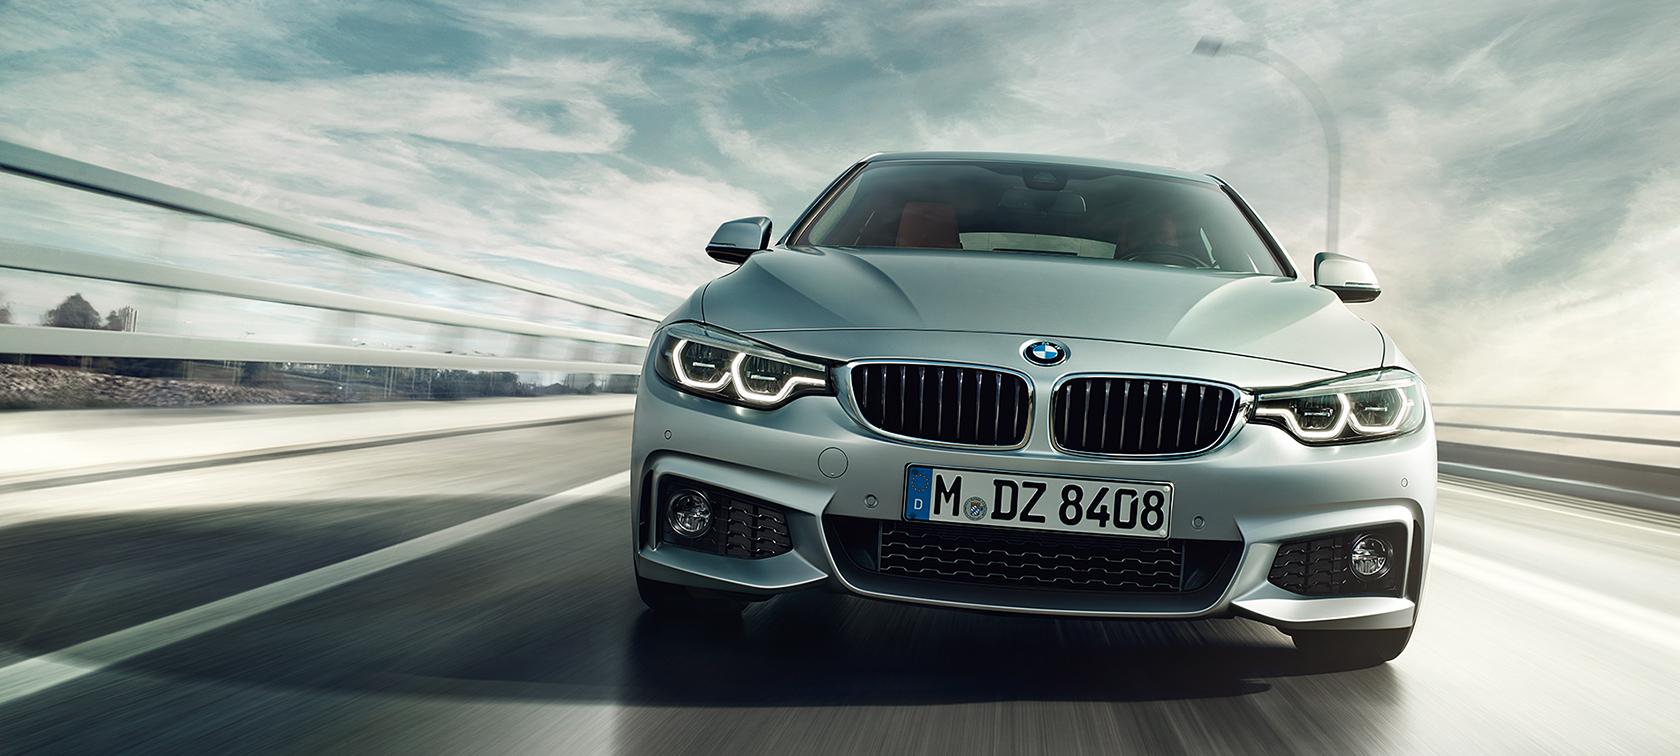 BMW 4 Series Gran Coupé: At a glance